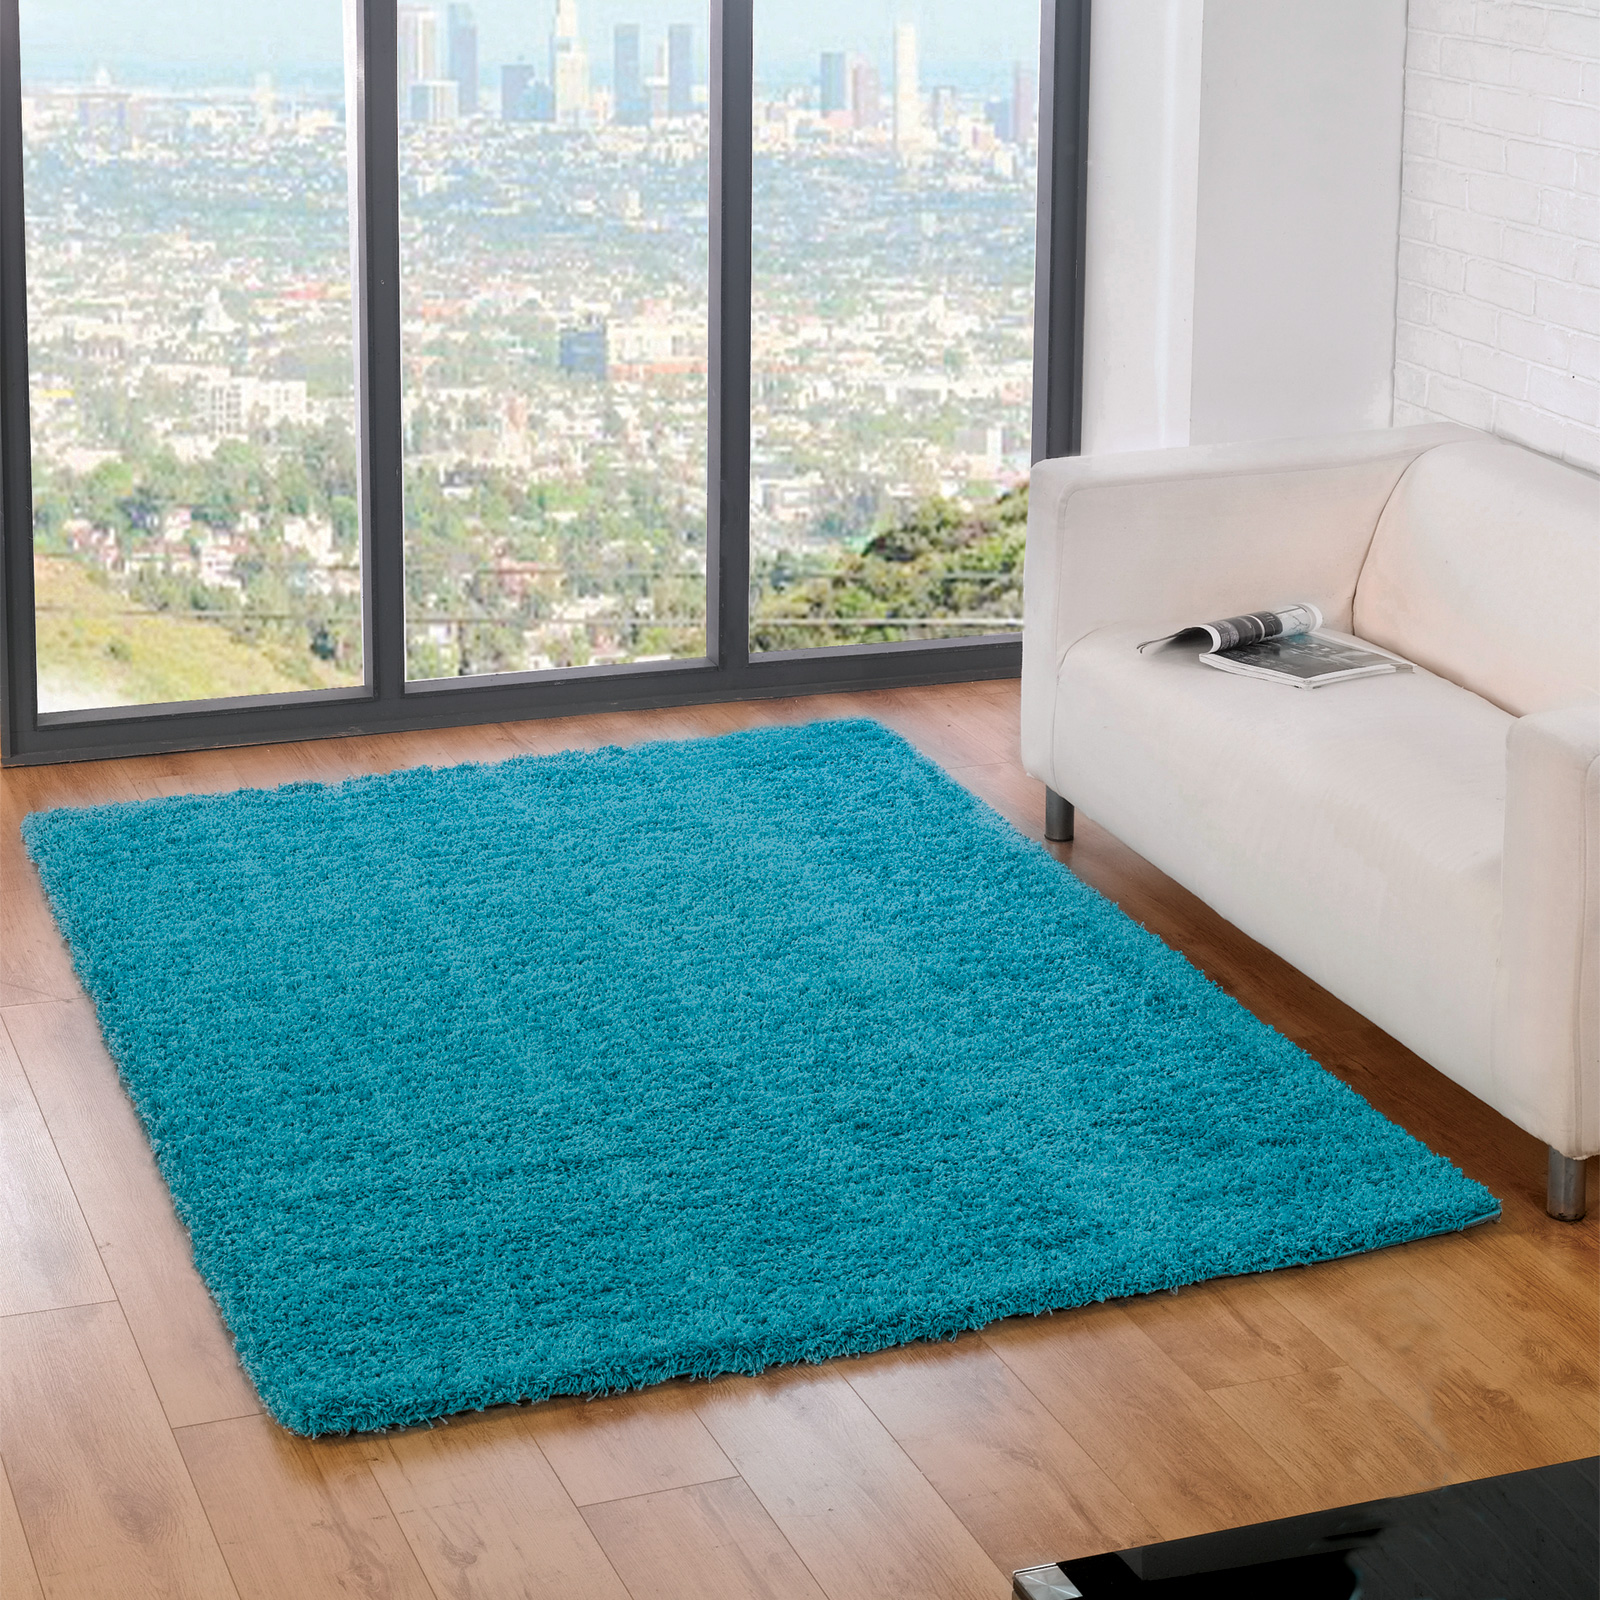 Plain shaggy carpet rug with 5cm deep pile soft warm for Soft carpet for bedrooms